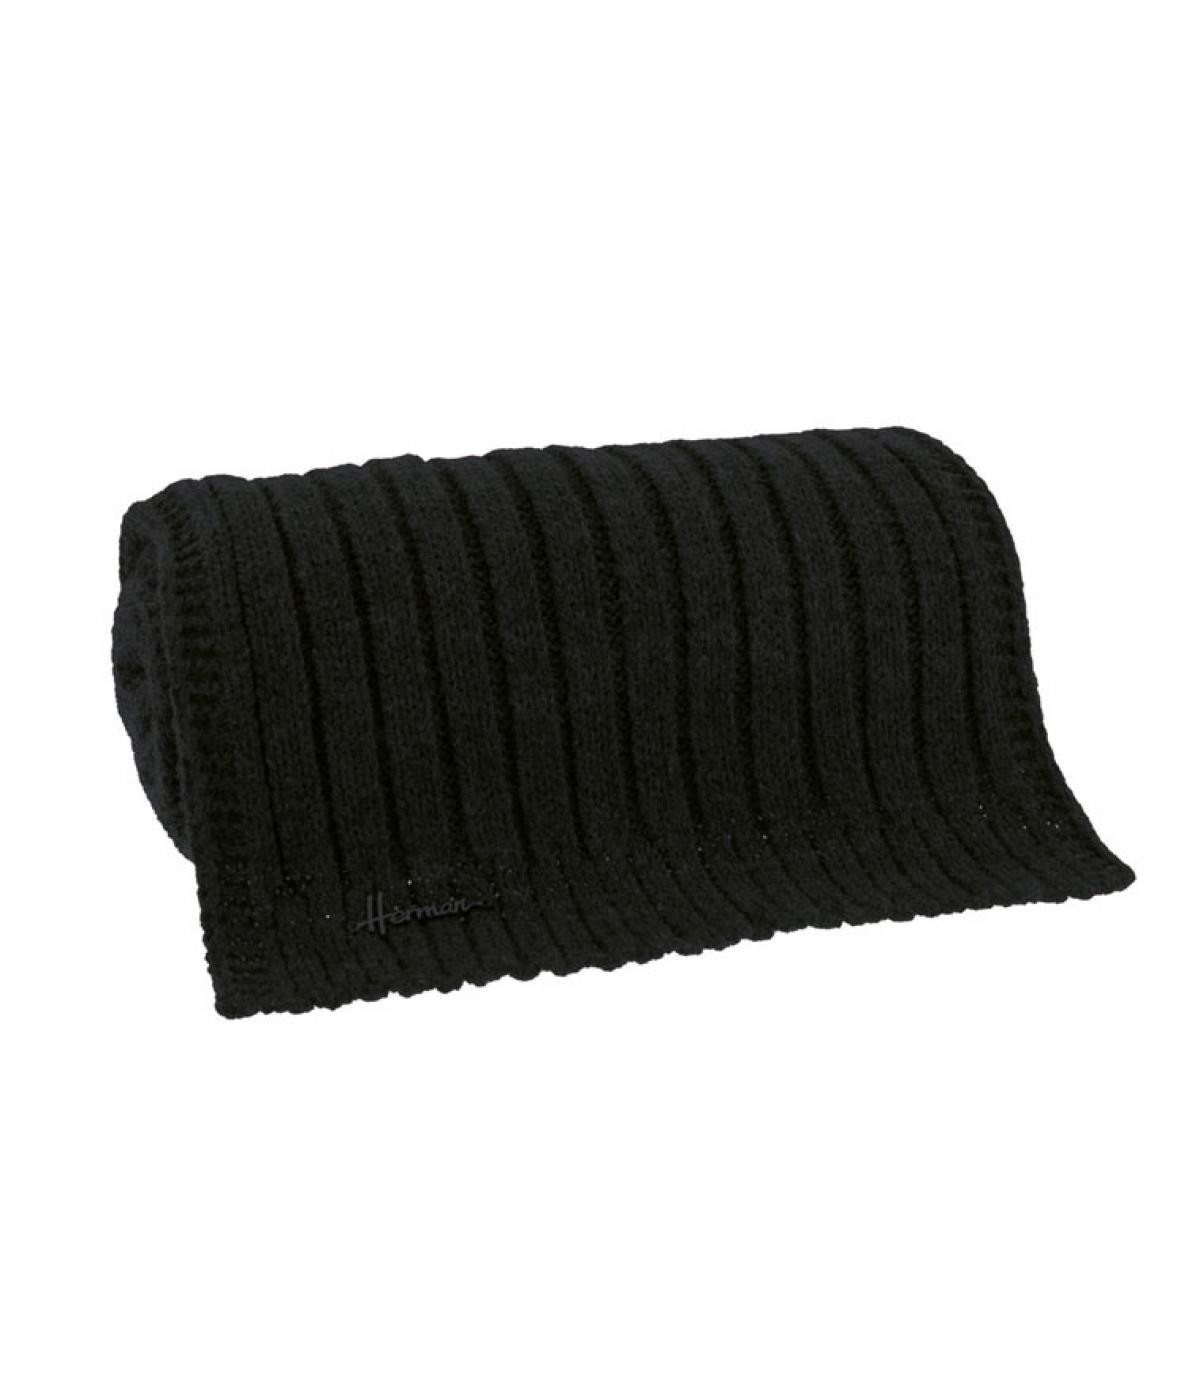 morbida sciarpa nera